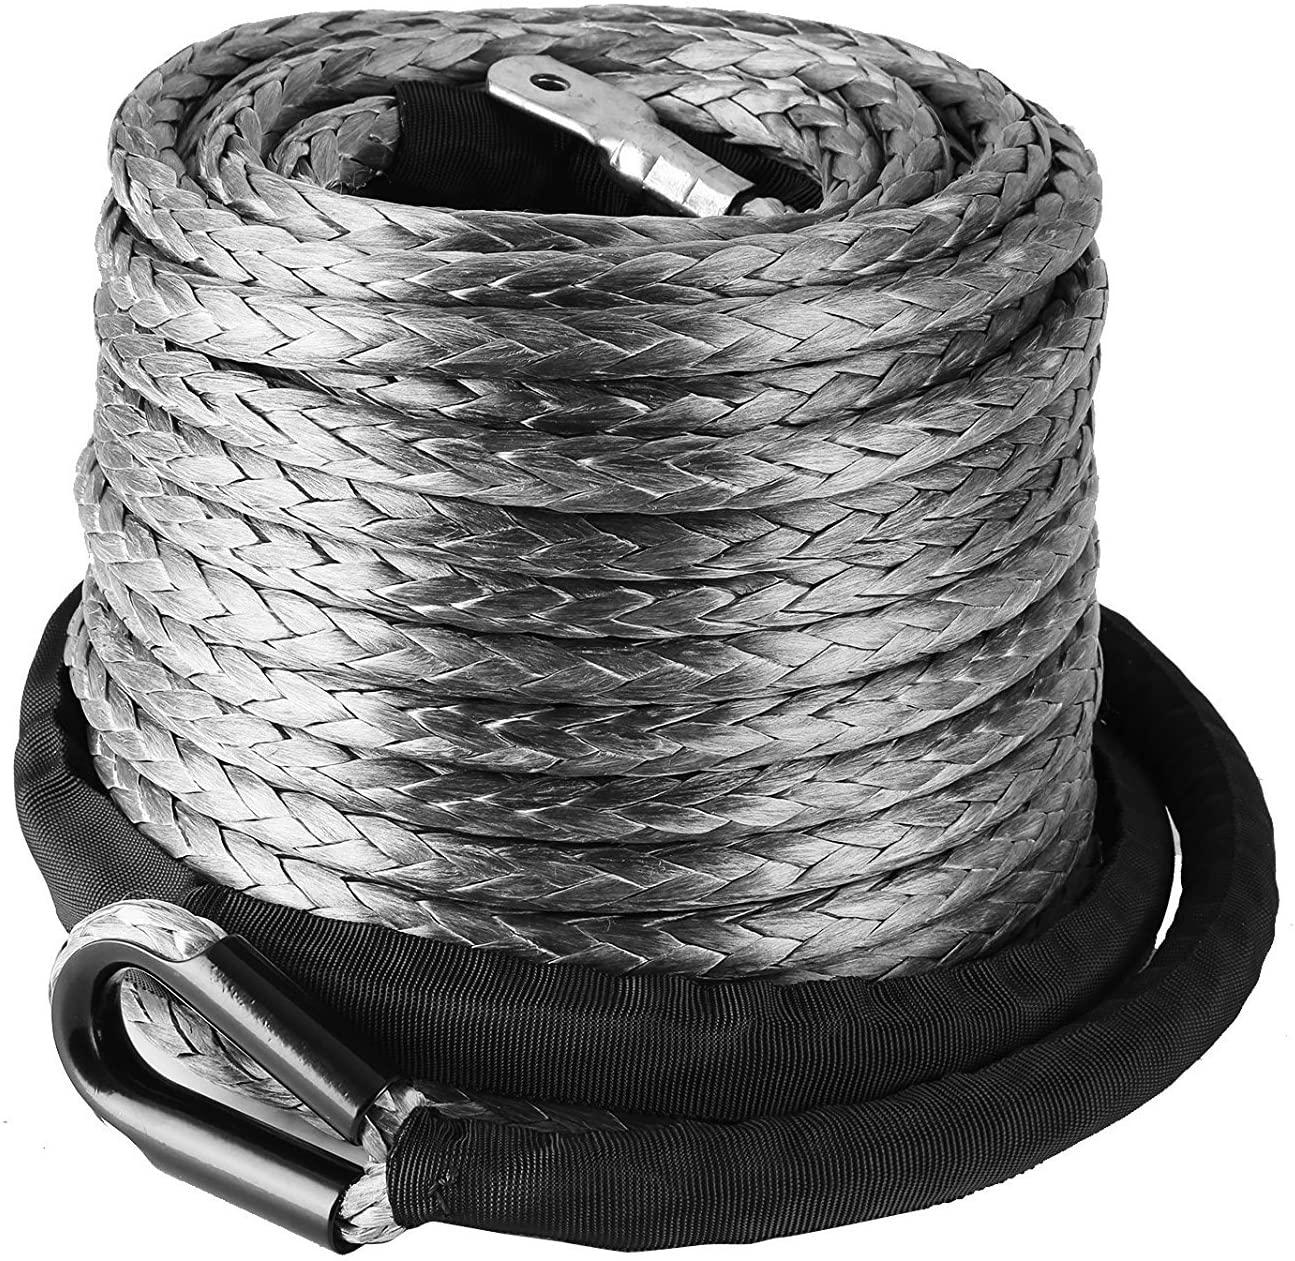 VEVOR 10mm * 28m, Cable del cabrestante ATV UTV sintético de Cable...